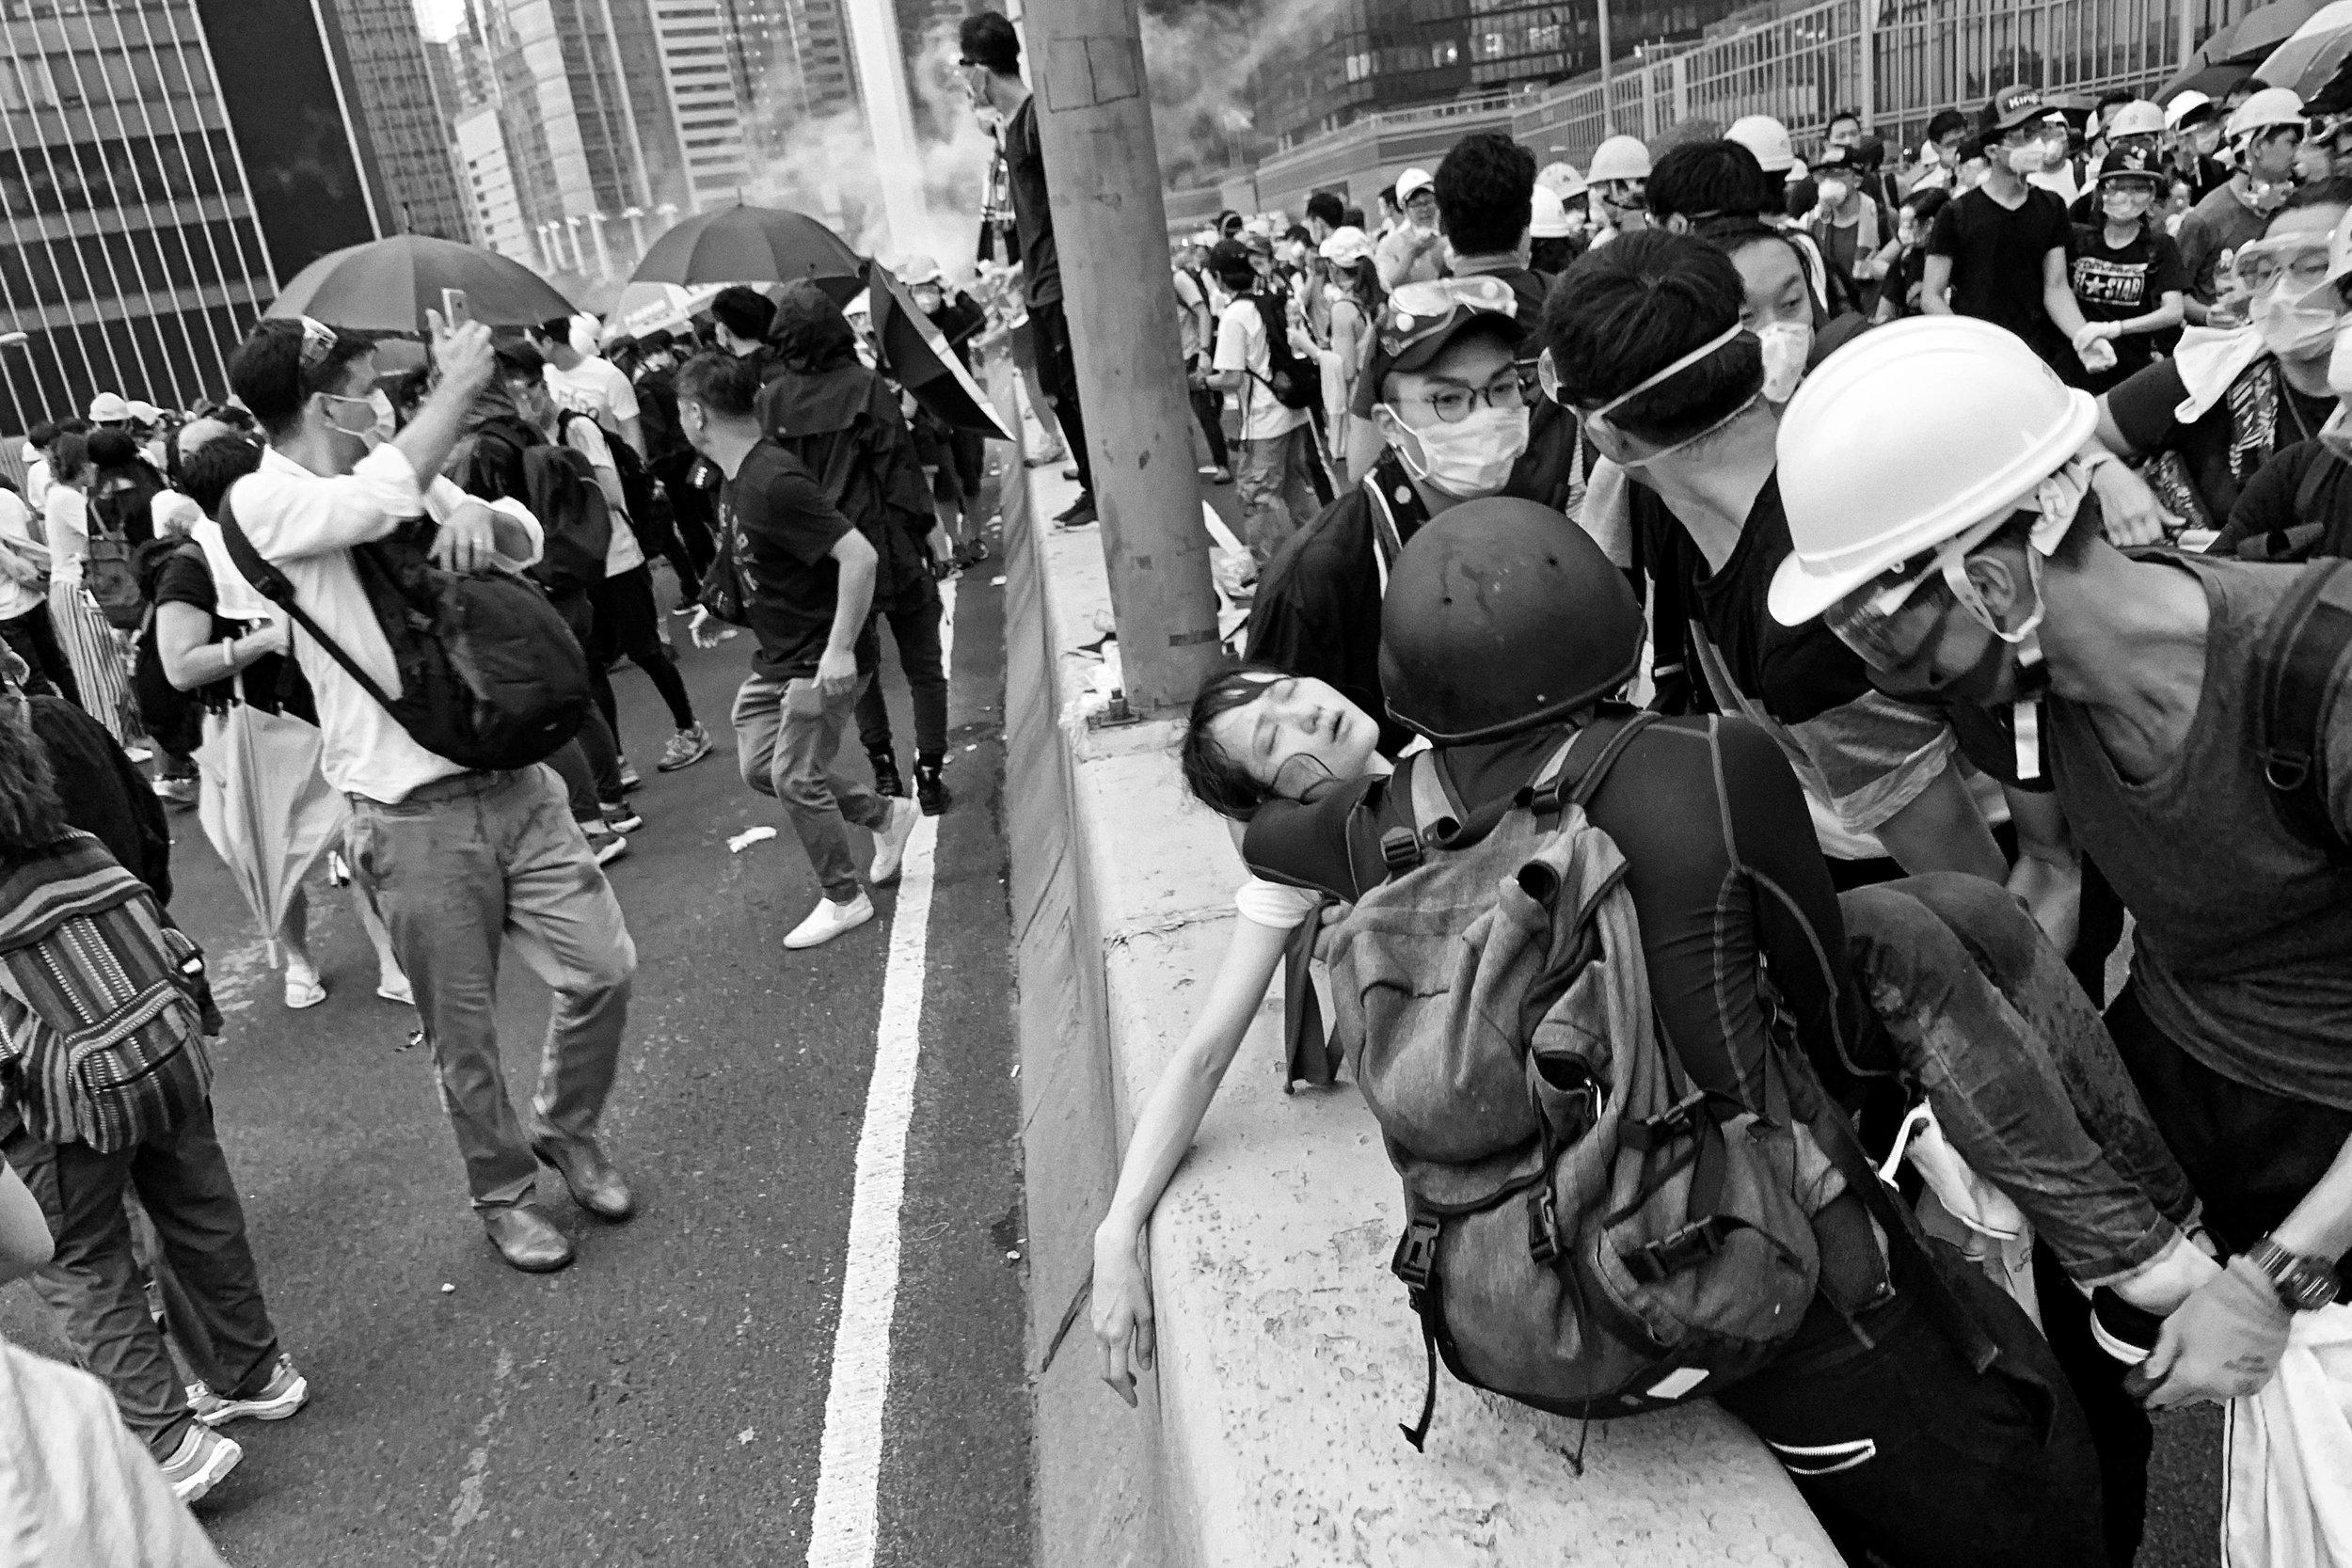 Photographed by  Joseph Wai-Hok Cheng